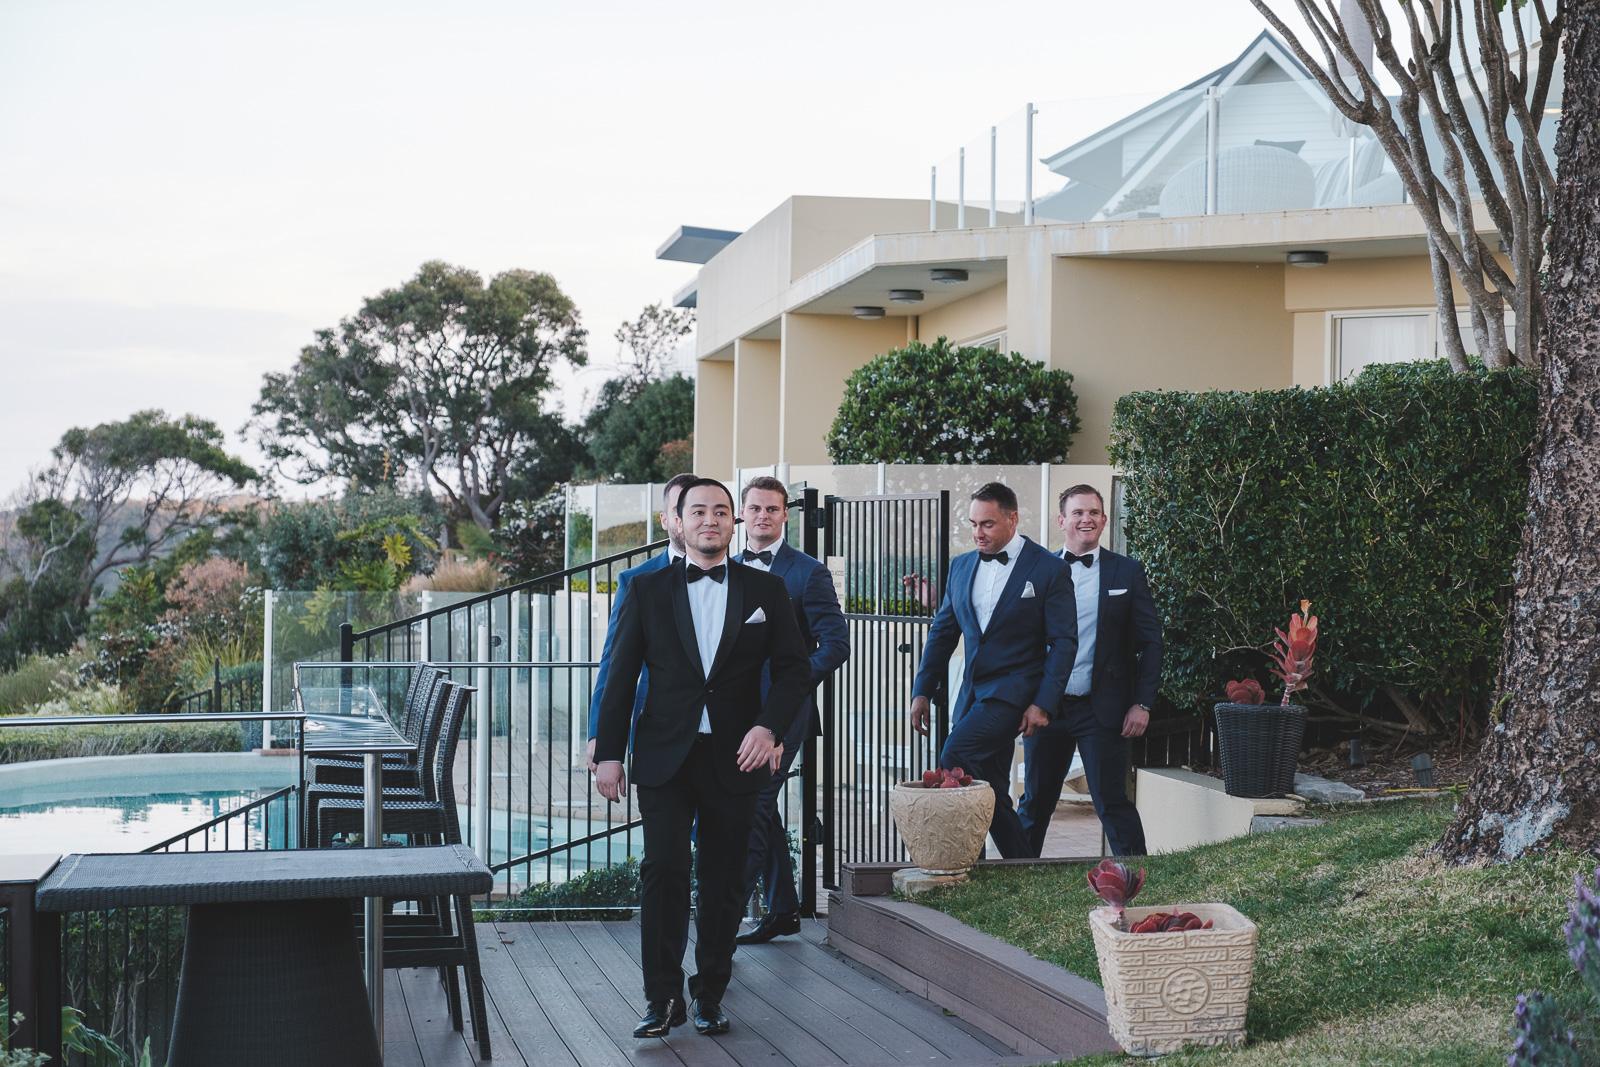 jonahs-whale-beach-wedding